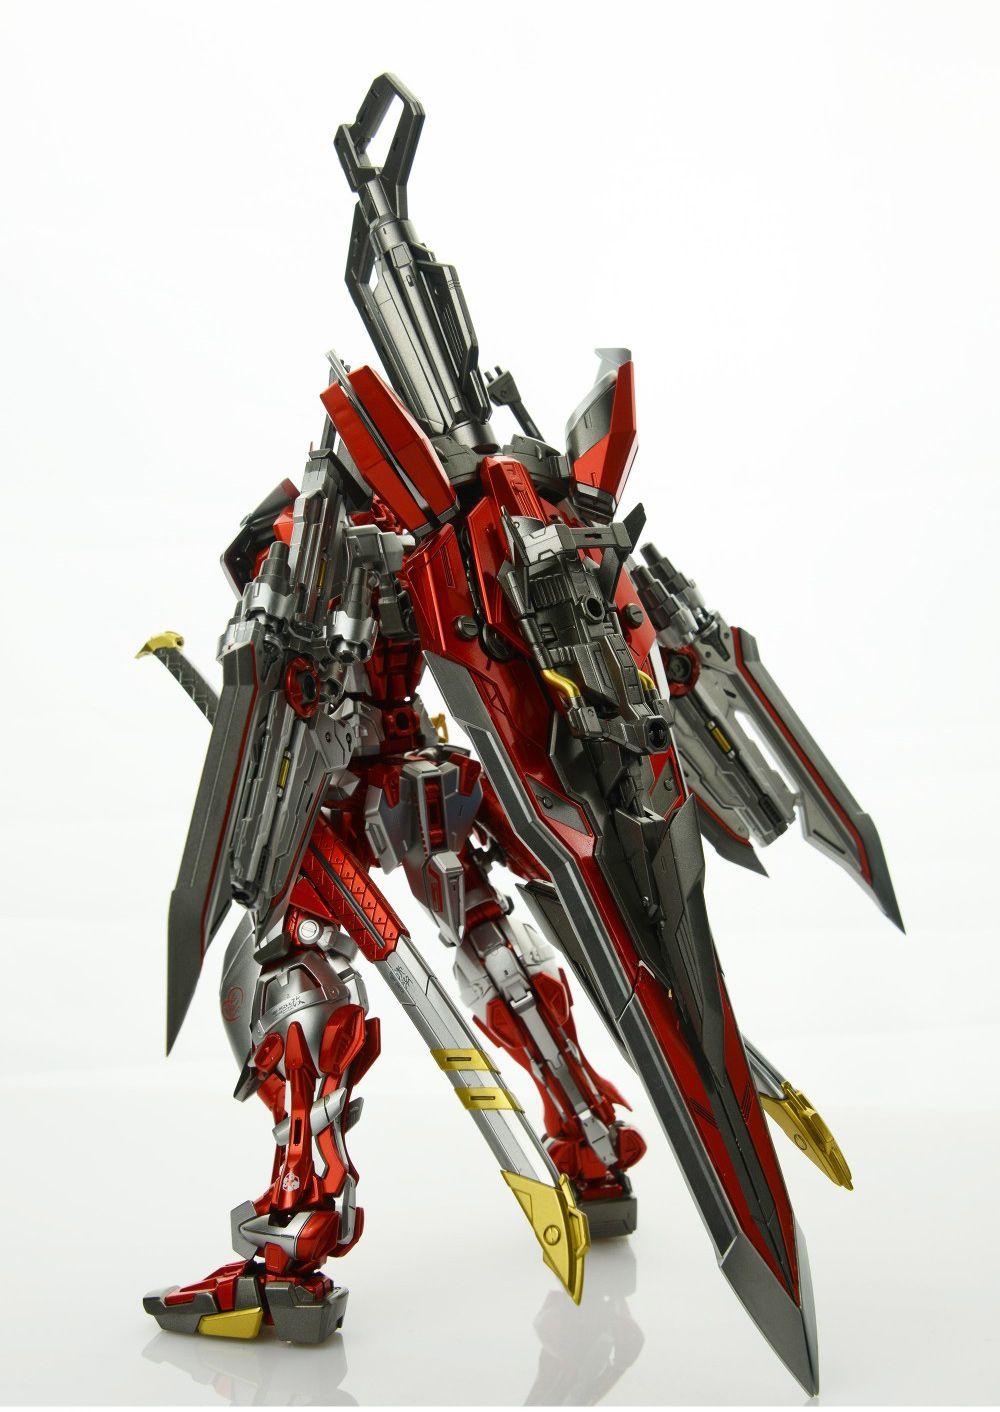 9242e1bb3a40 Custom Build  MG 1 100 Gundam Astray Red Frame Kai + Caletvwlch - Gundam  Kits Collection News and Reviews